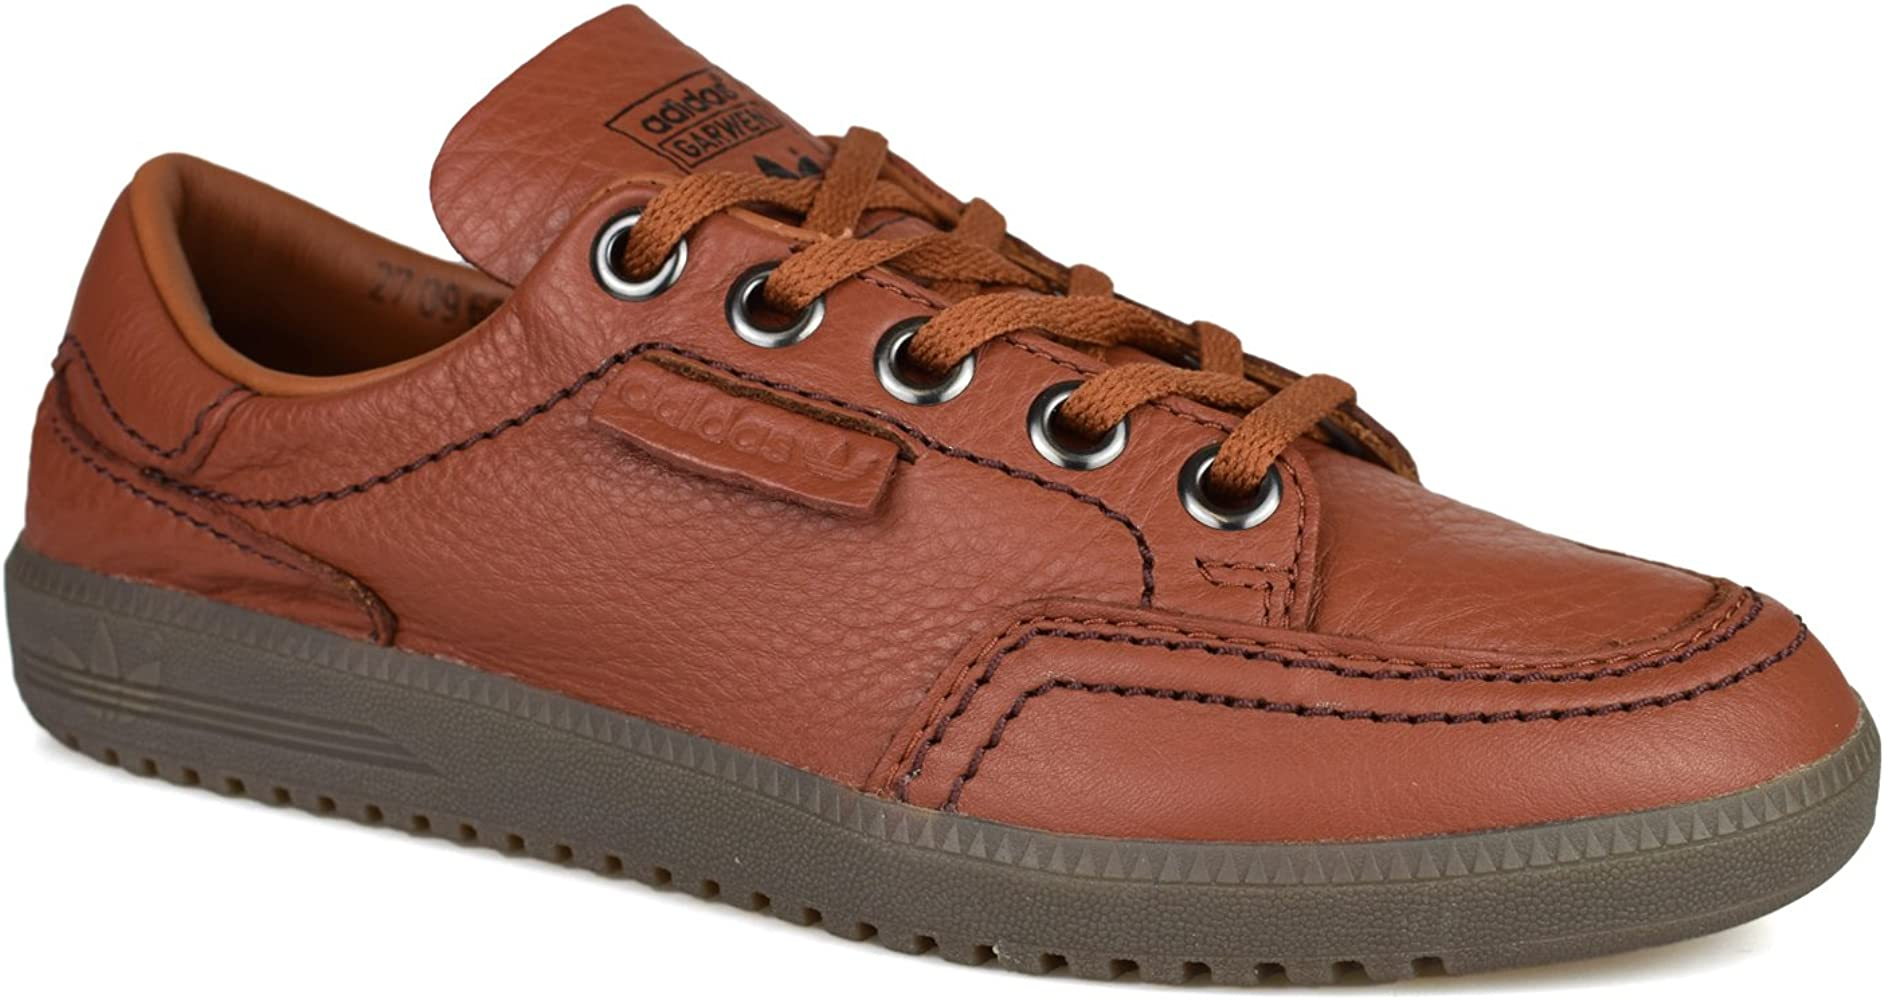 adidas spezial leather